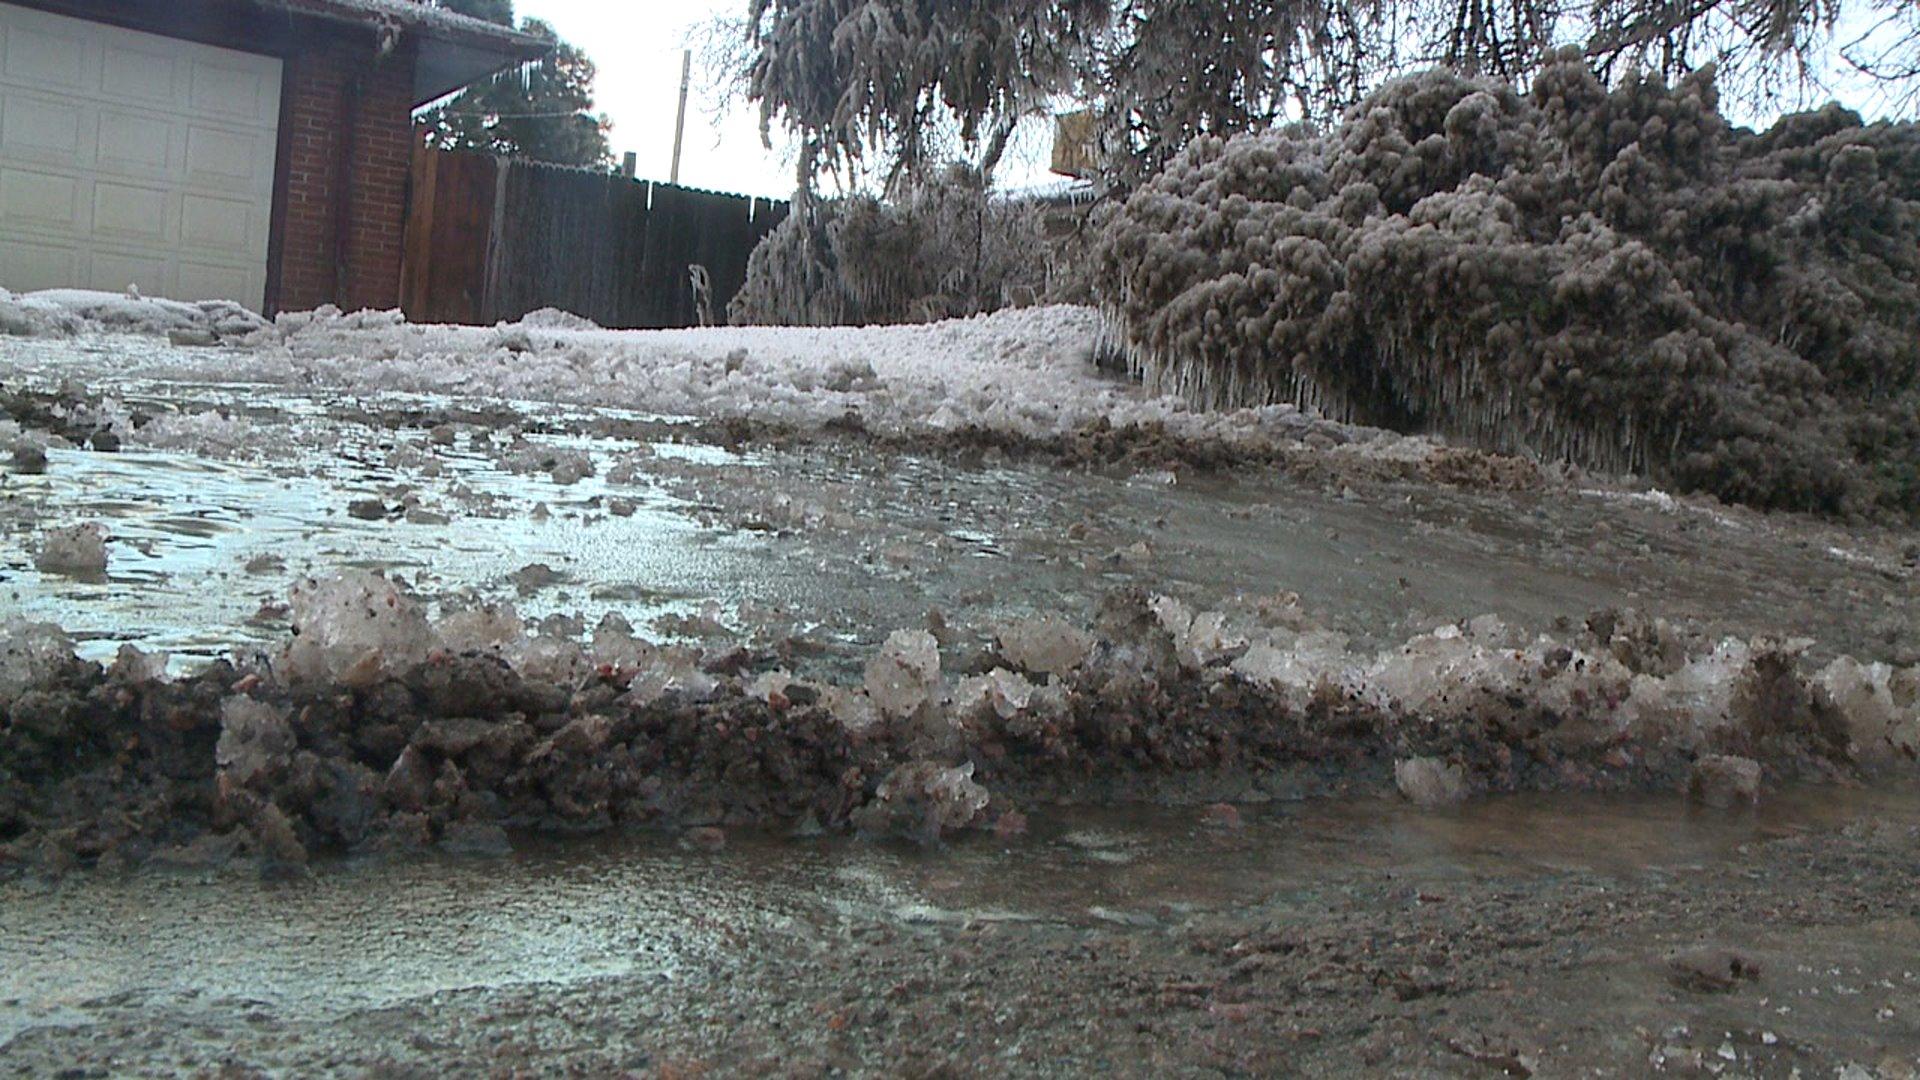 Water main break an icy nightmare for Lakewood neighborhood